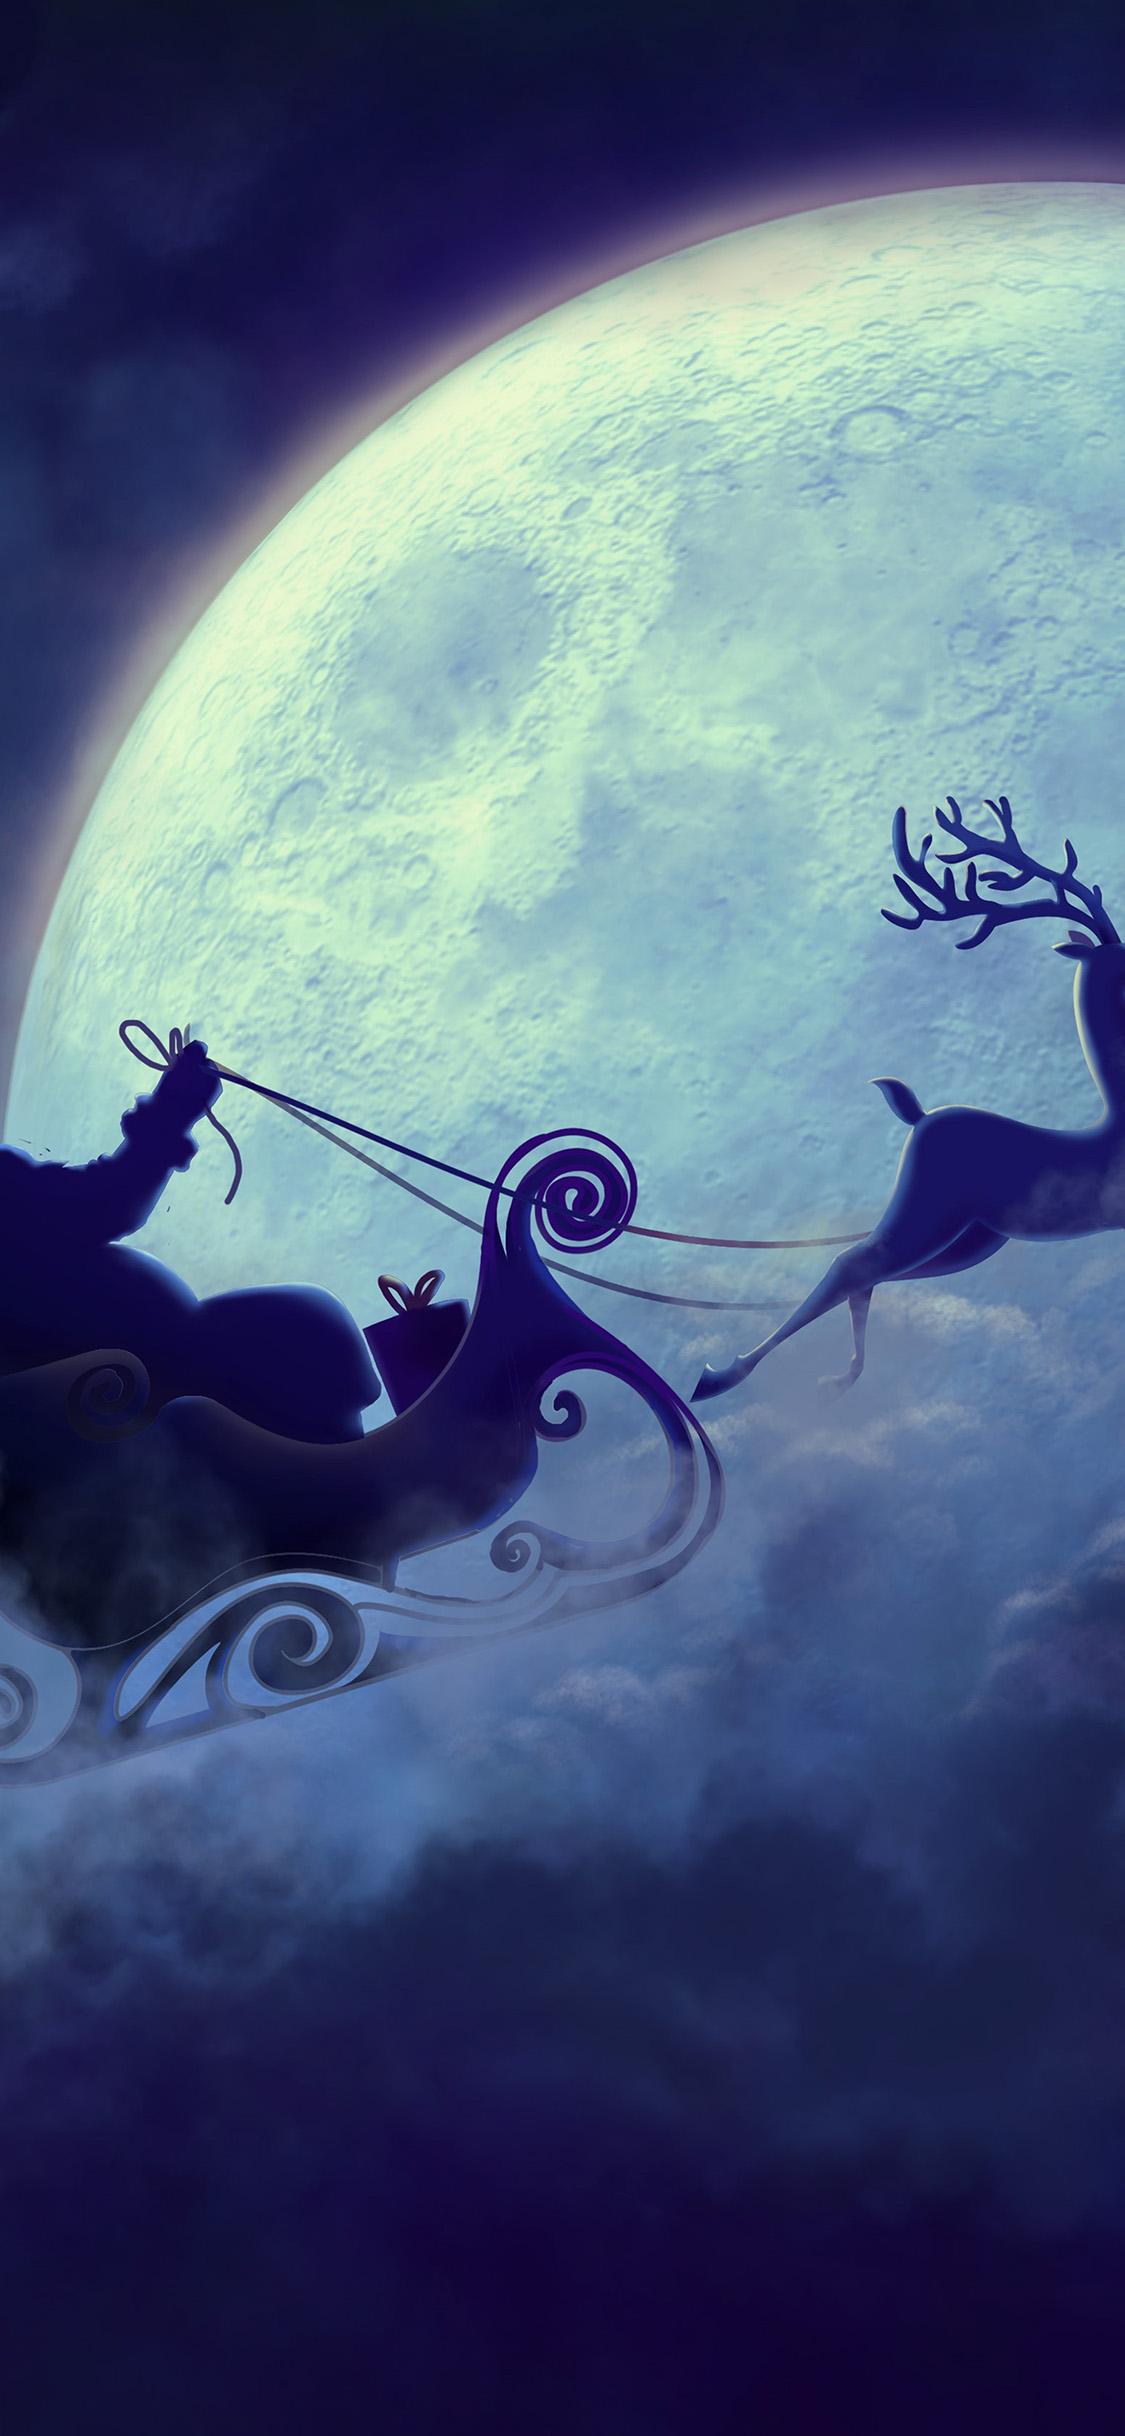 iPhonexpapers.com-Apple-iPhone-wallpaper-bj82-art-christmas-santa-night